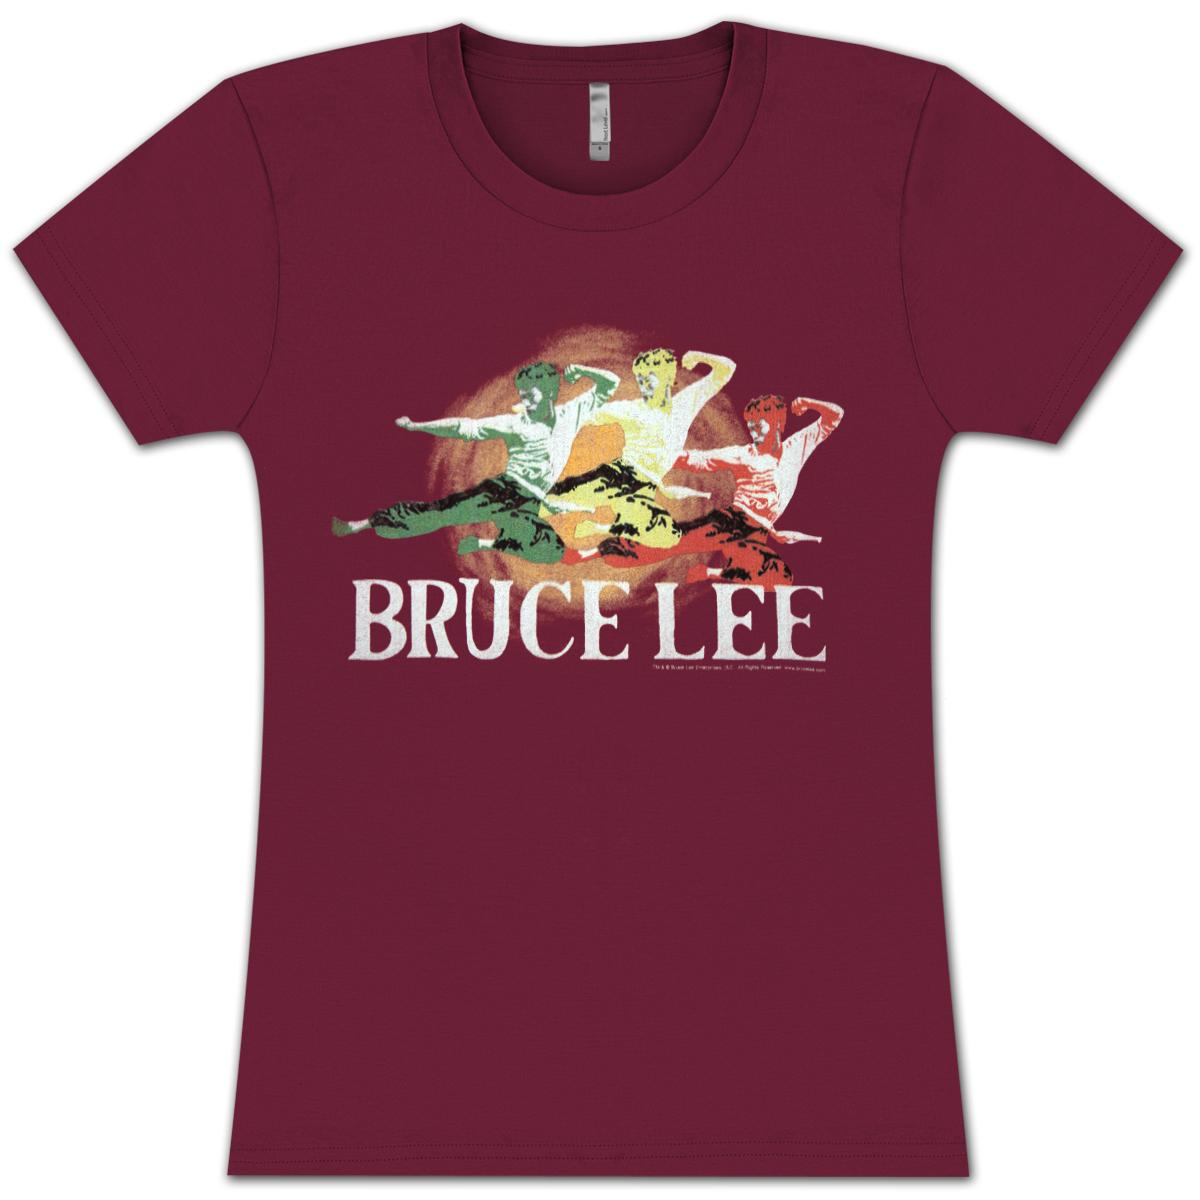 Bruce Lee Tri-Color Junior T-shirt